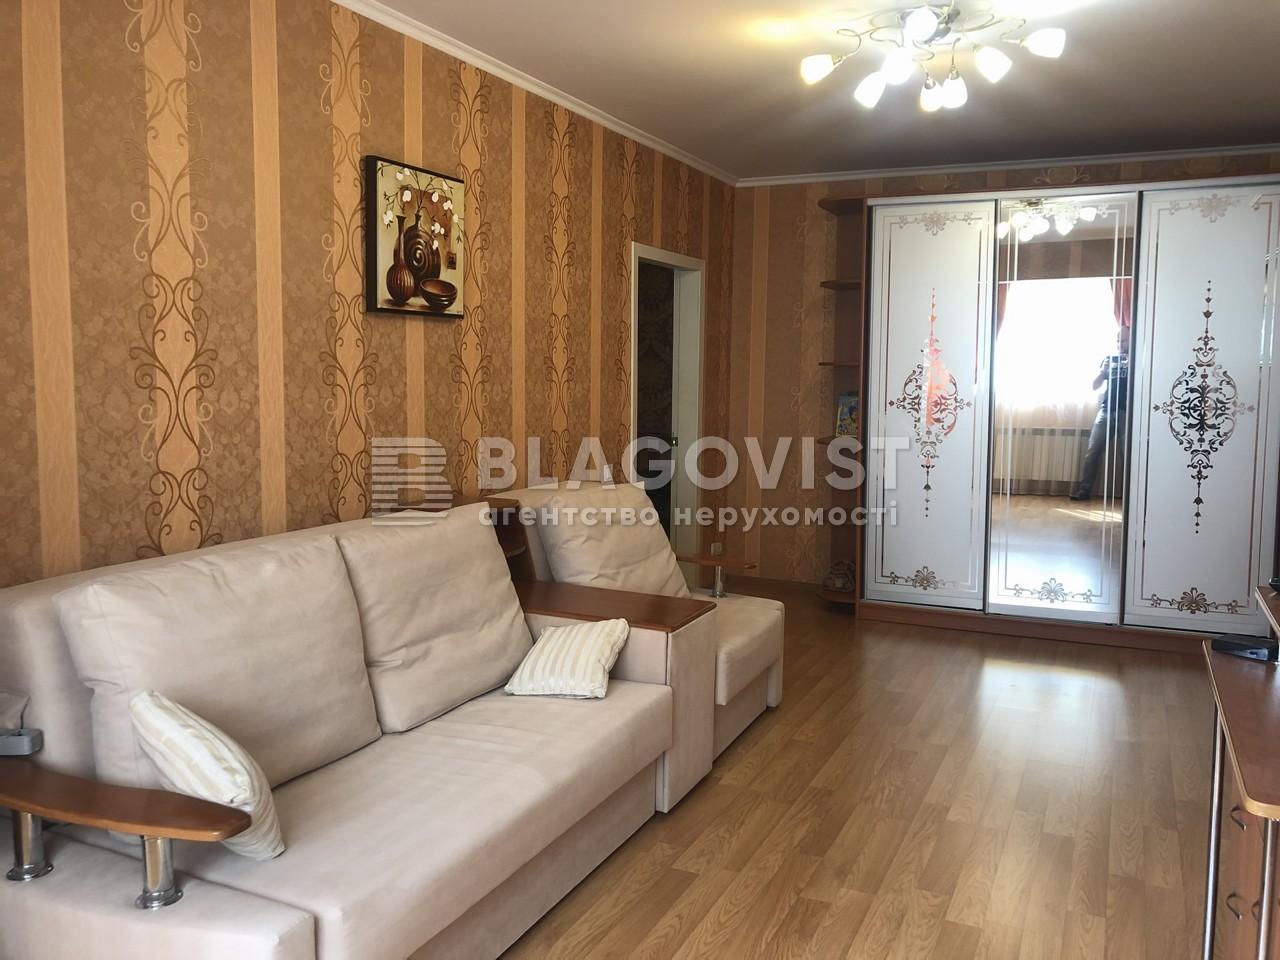 Квартира E-40947, Правды просп., 37а, Киев - Фото 5